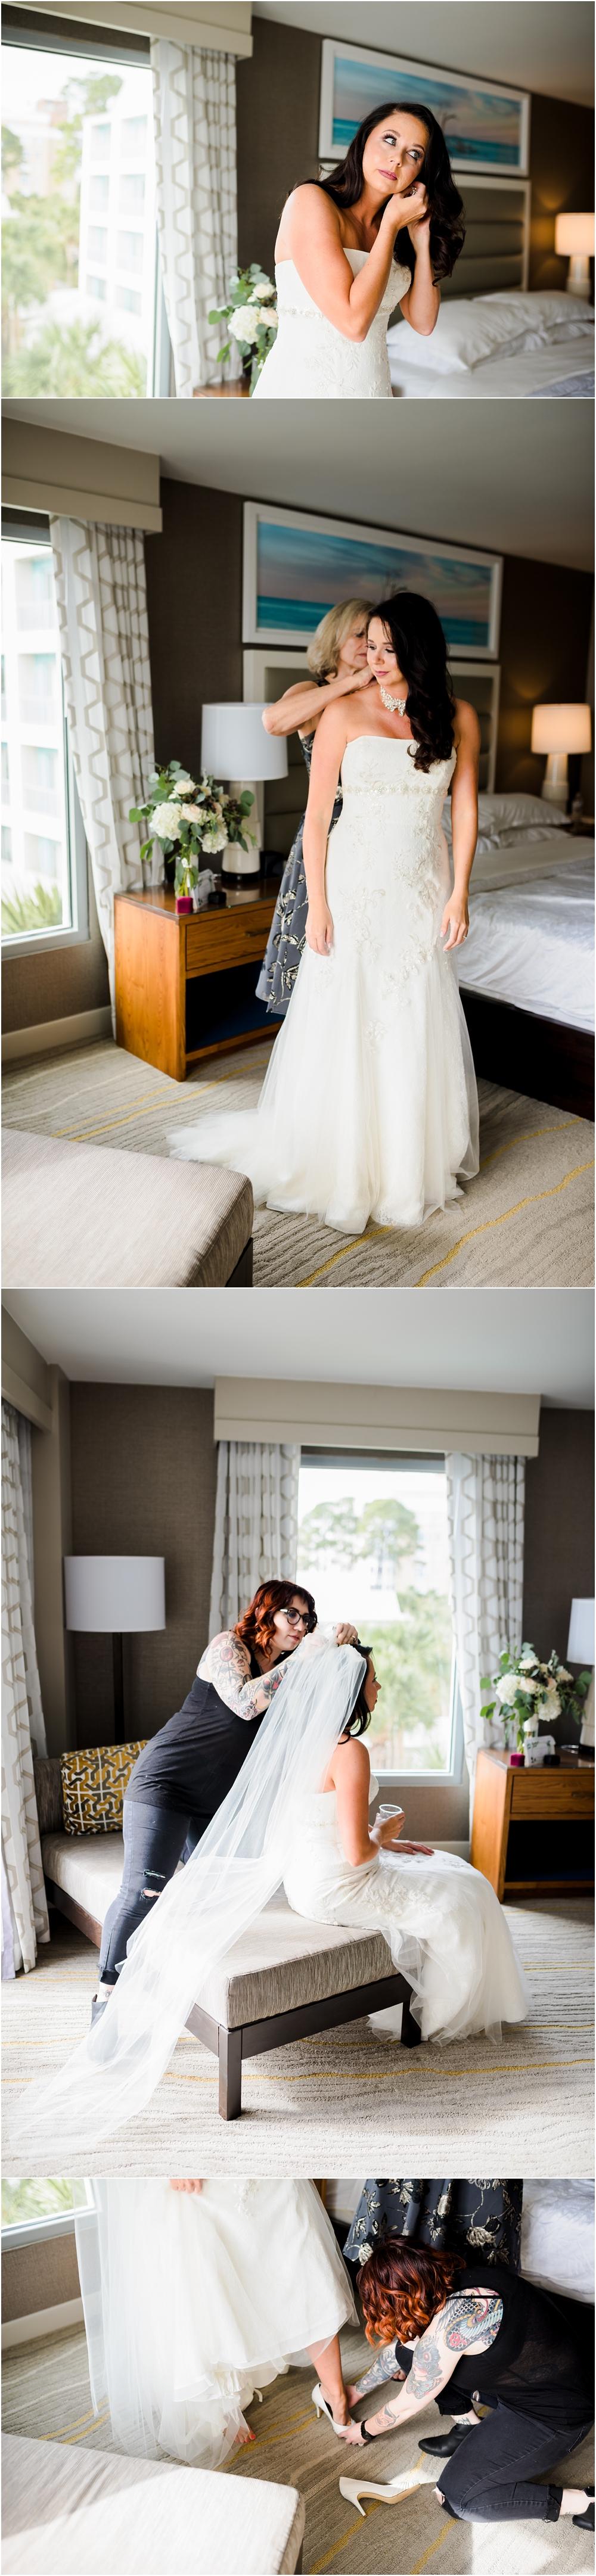 quinn-bay-point-sheraton-florida-wedding-photographer-kiersten-grant-22.jpg